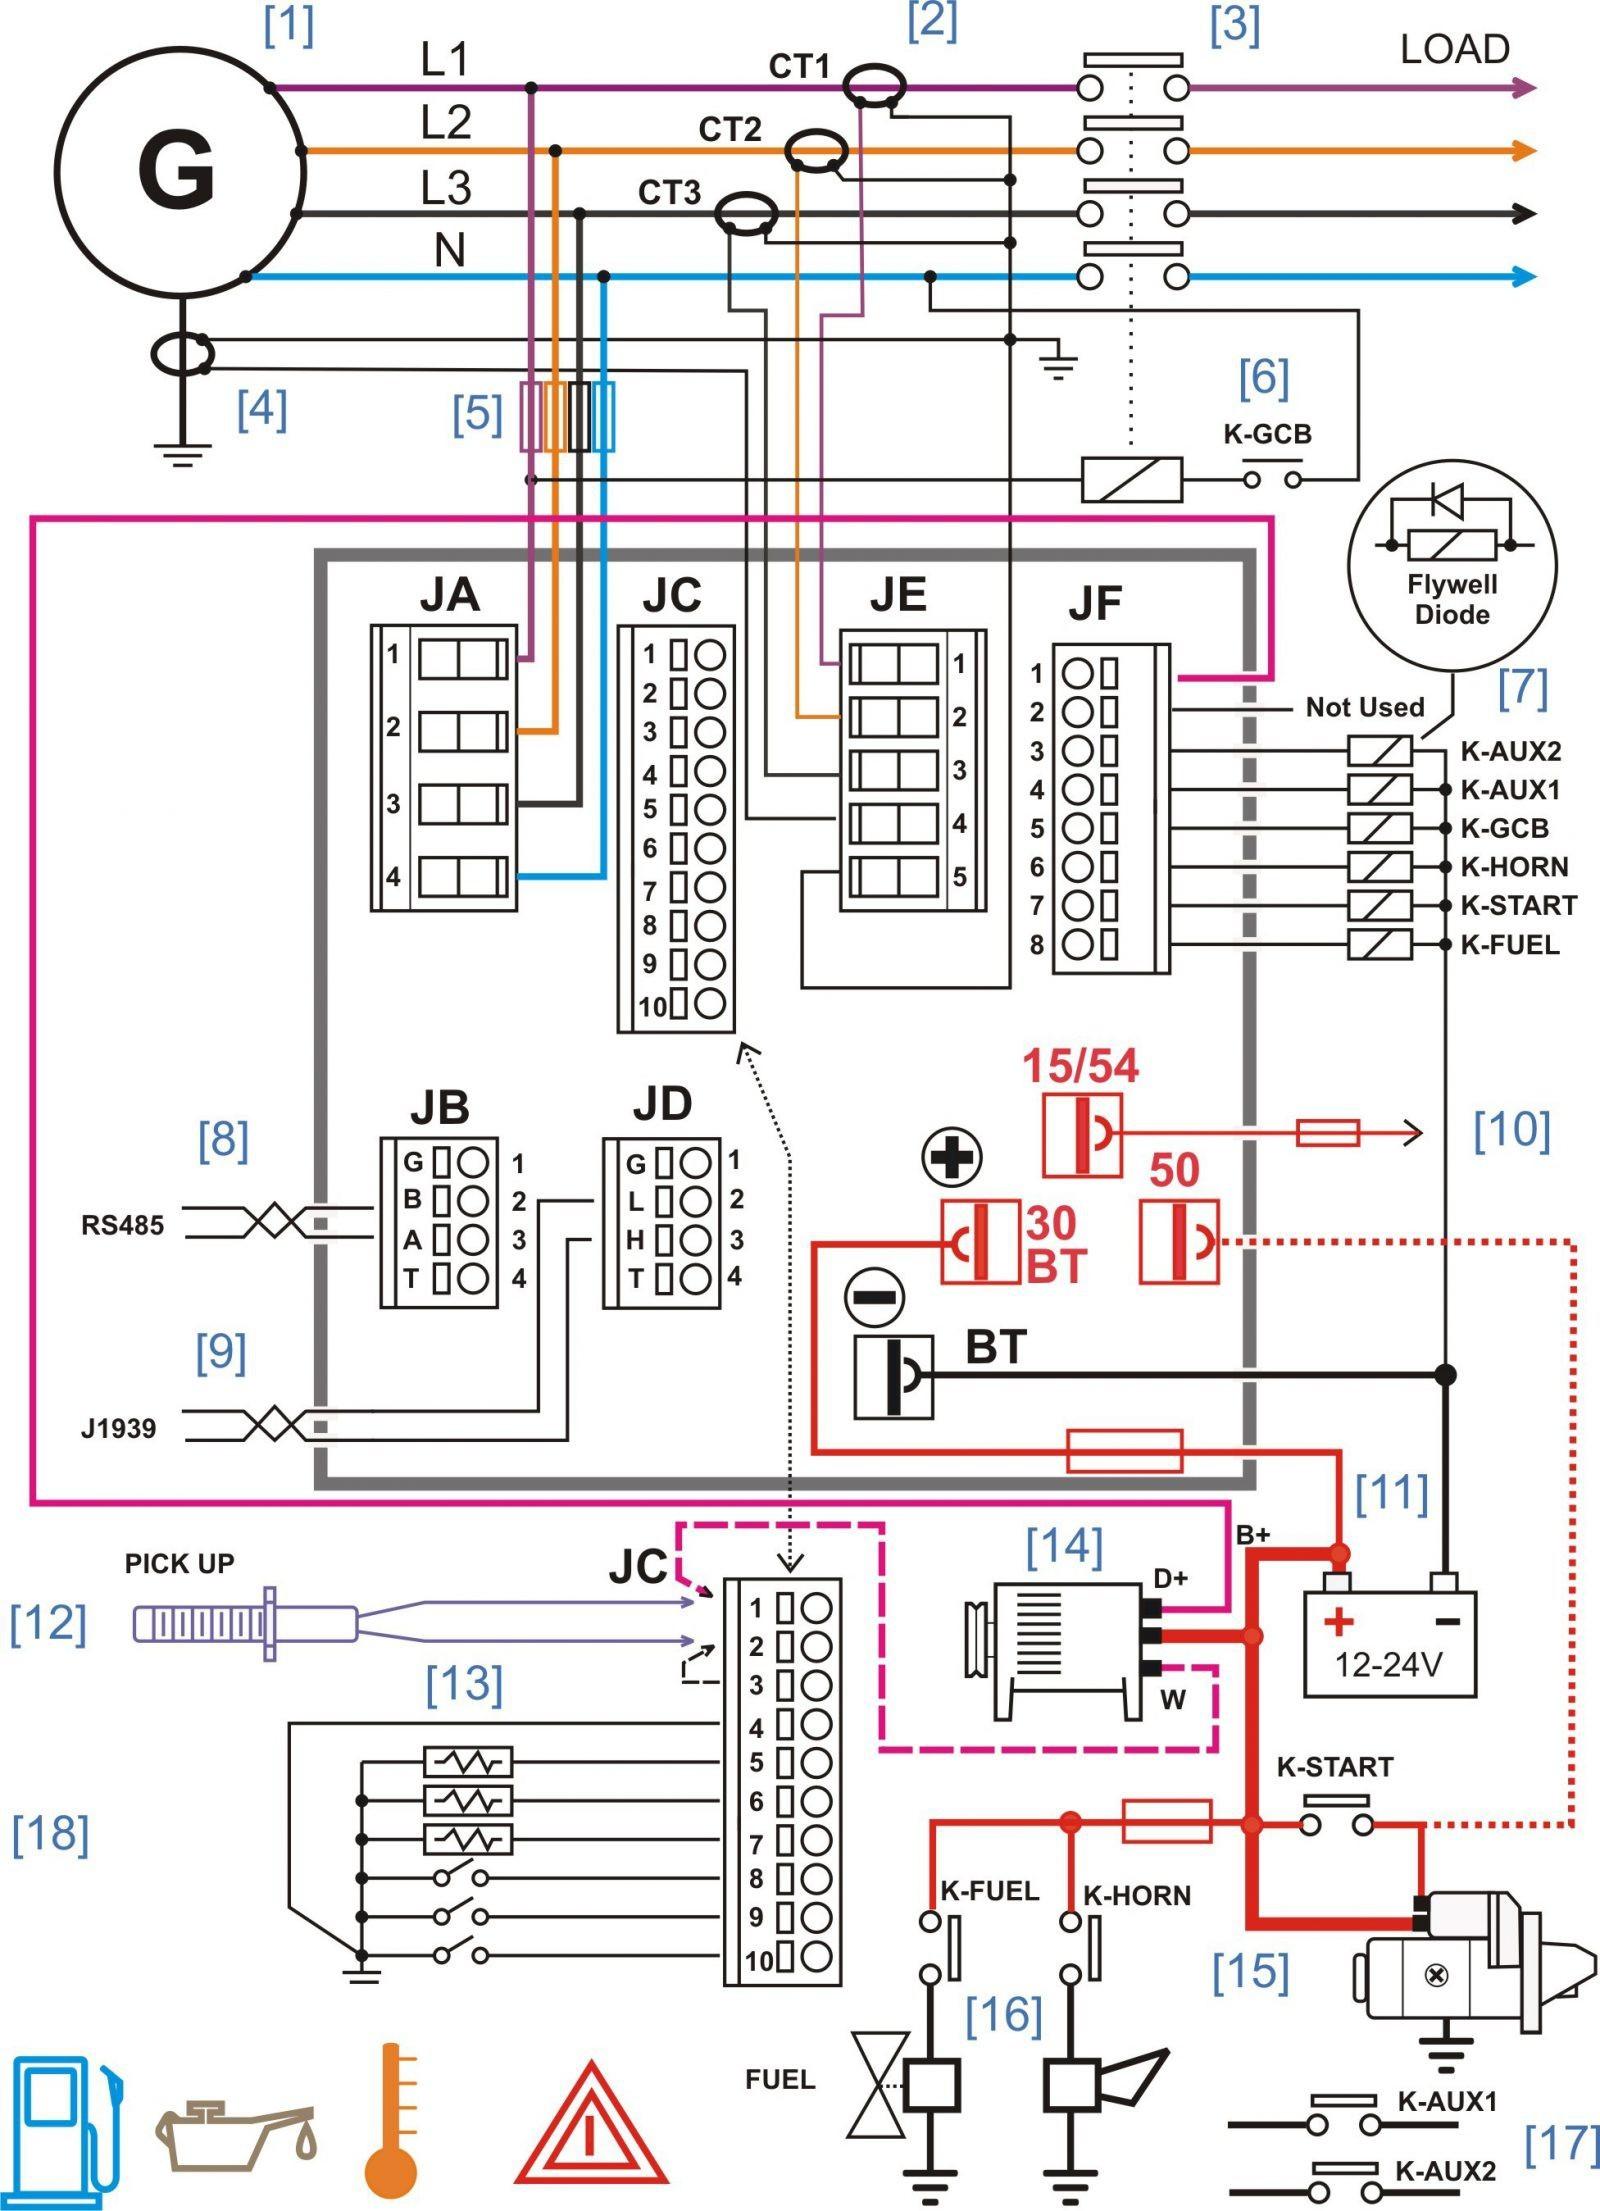 Jvc Car Audio Wiring Diagram Lovely Car Stereo Wiring Diagram Diagram Of Jvc Car Audio Wiring Diagram